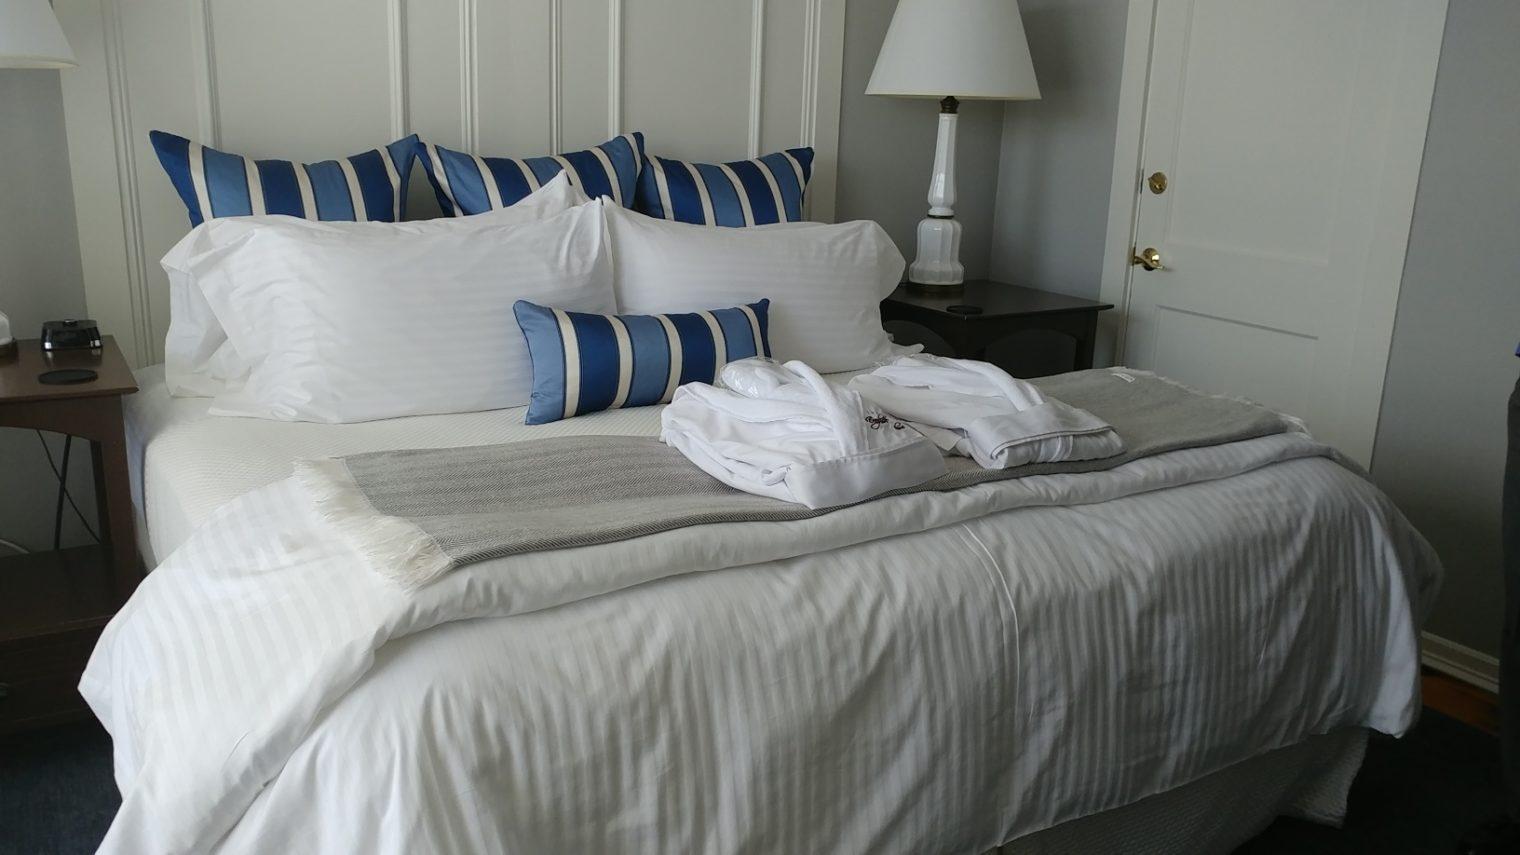 Guest room at Inn at English Meadows